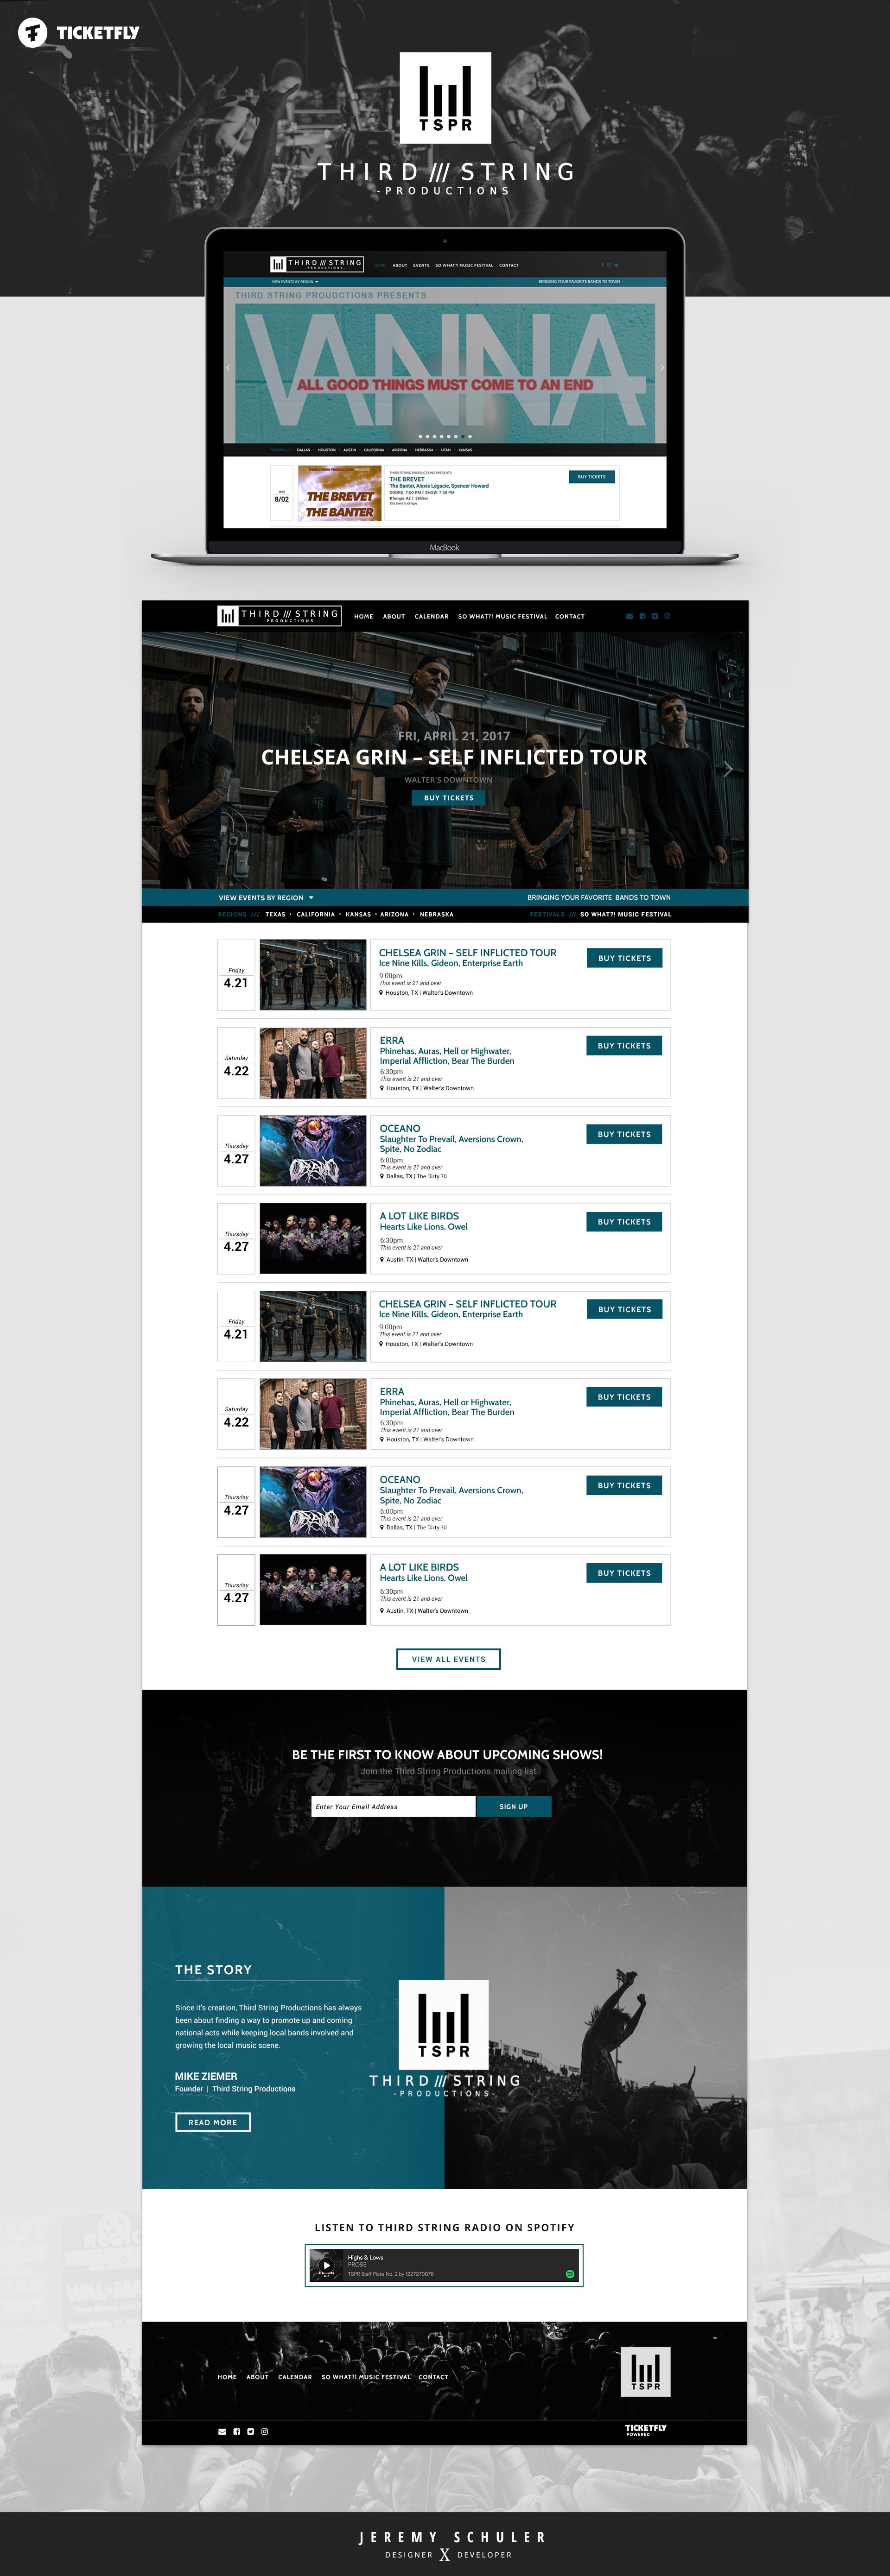 Schuler - Portfolio - Web Design - Third String Productions - Music Promoter - WordPress - Ticketfly Live Events Platform